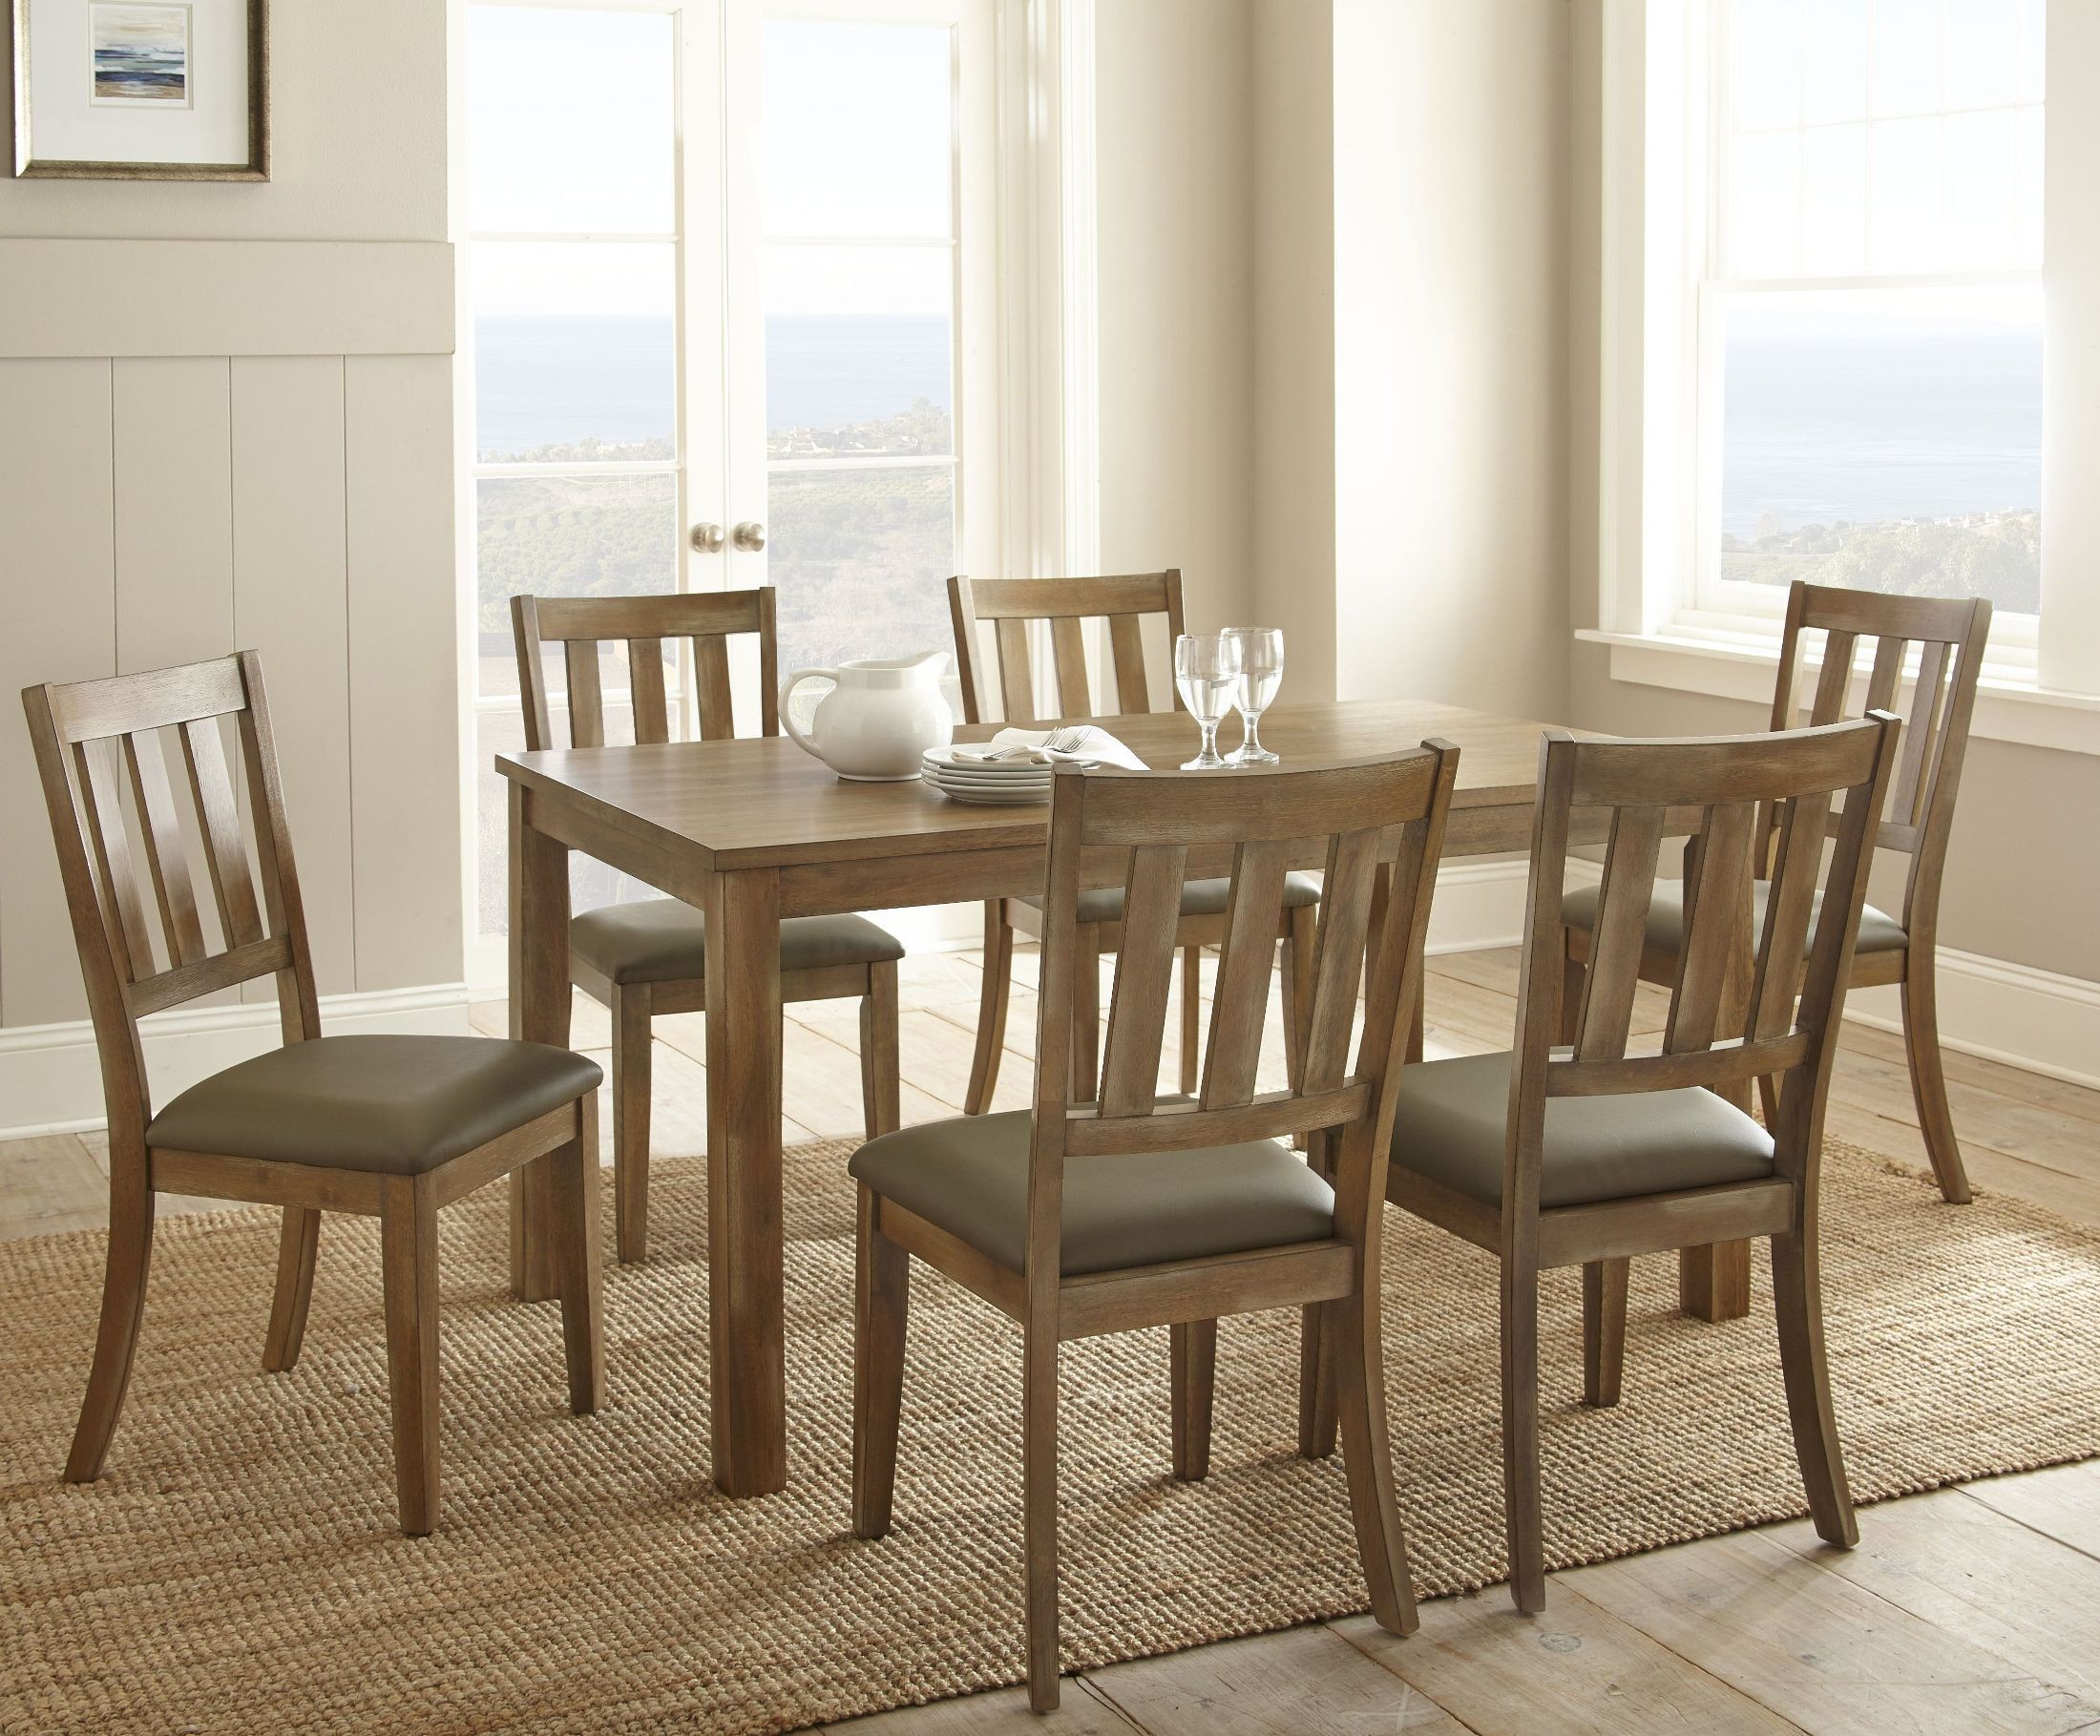 Ander Washed Pine Rectangular Dining Room Set Ad450t